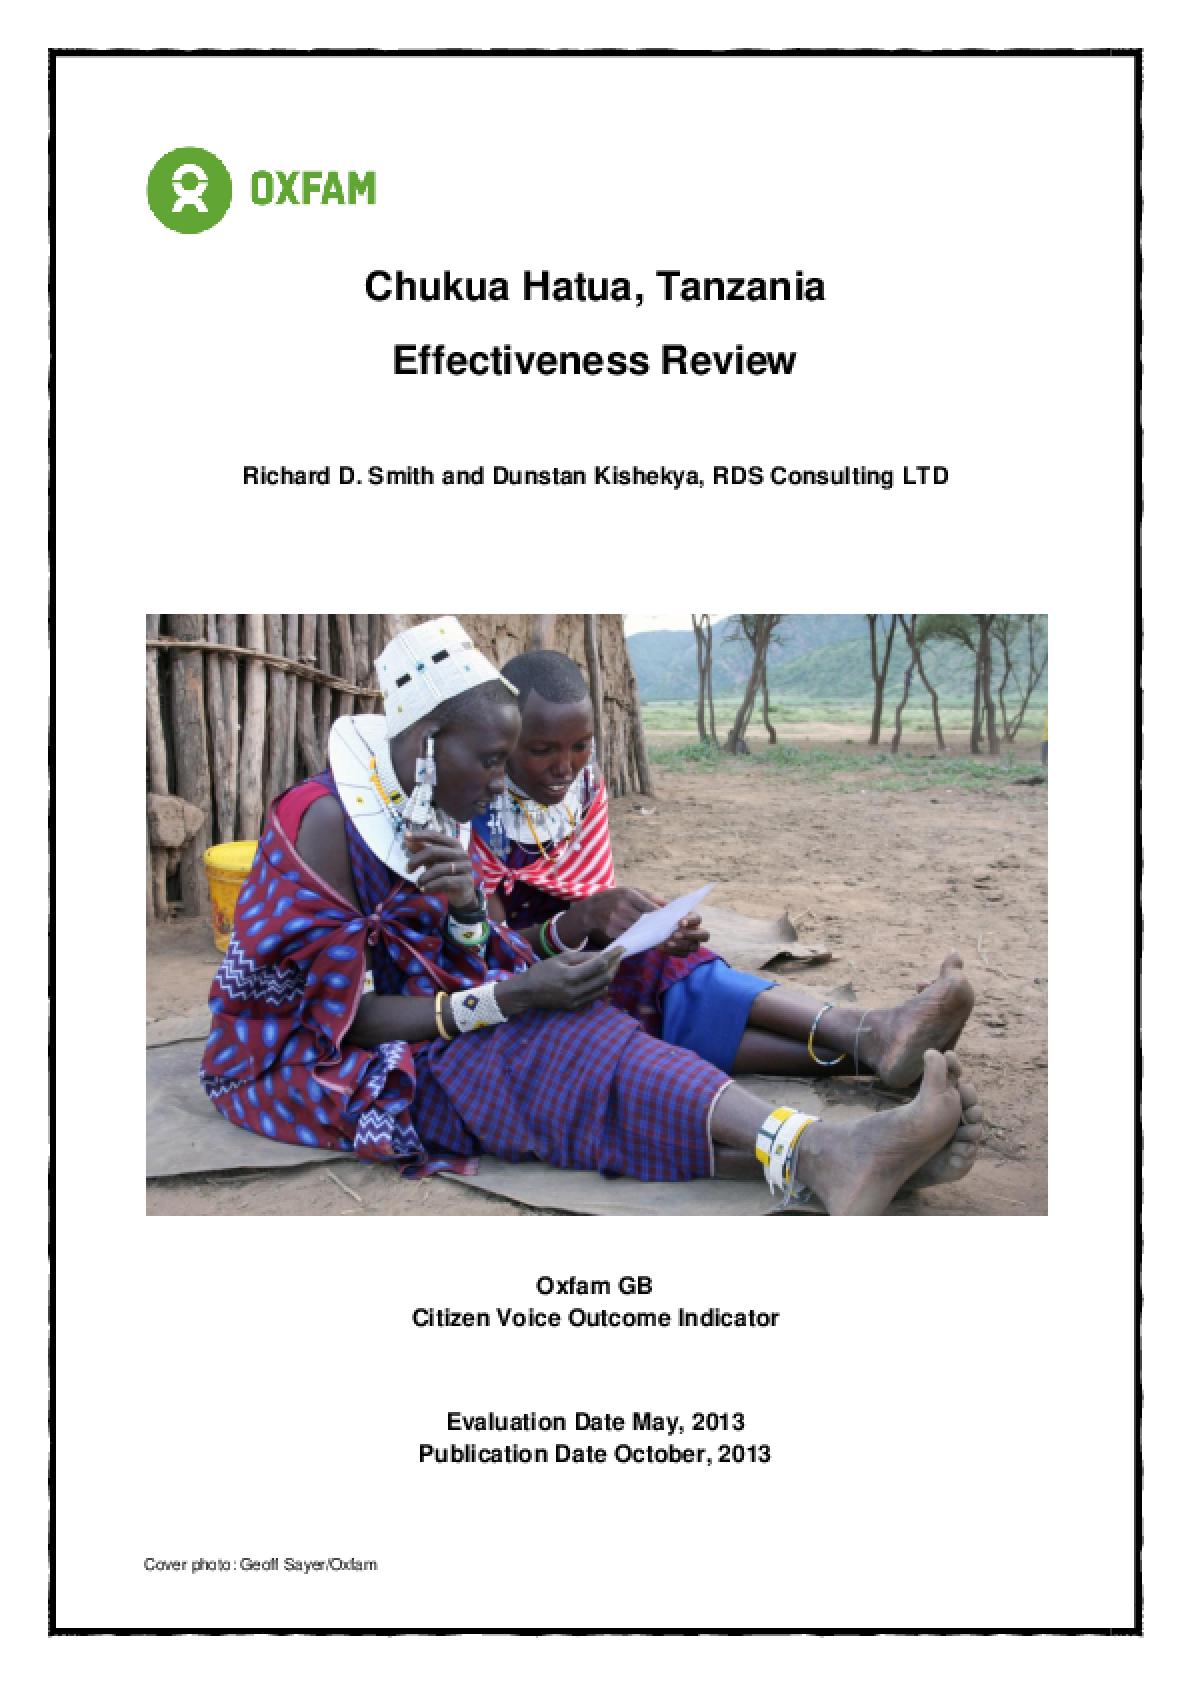 Effectiveness Review: Chukua Hatua Tanzania